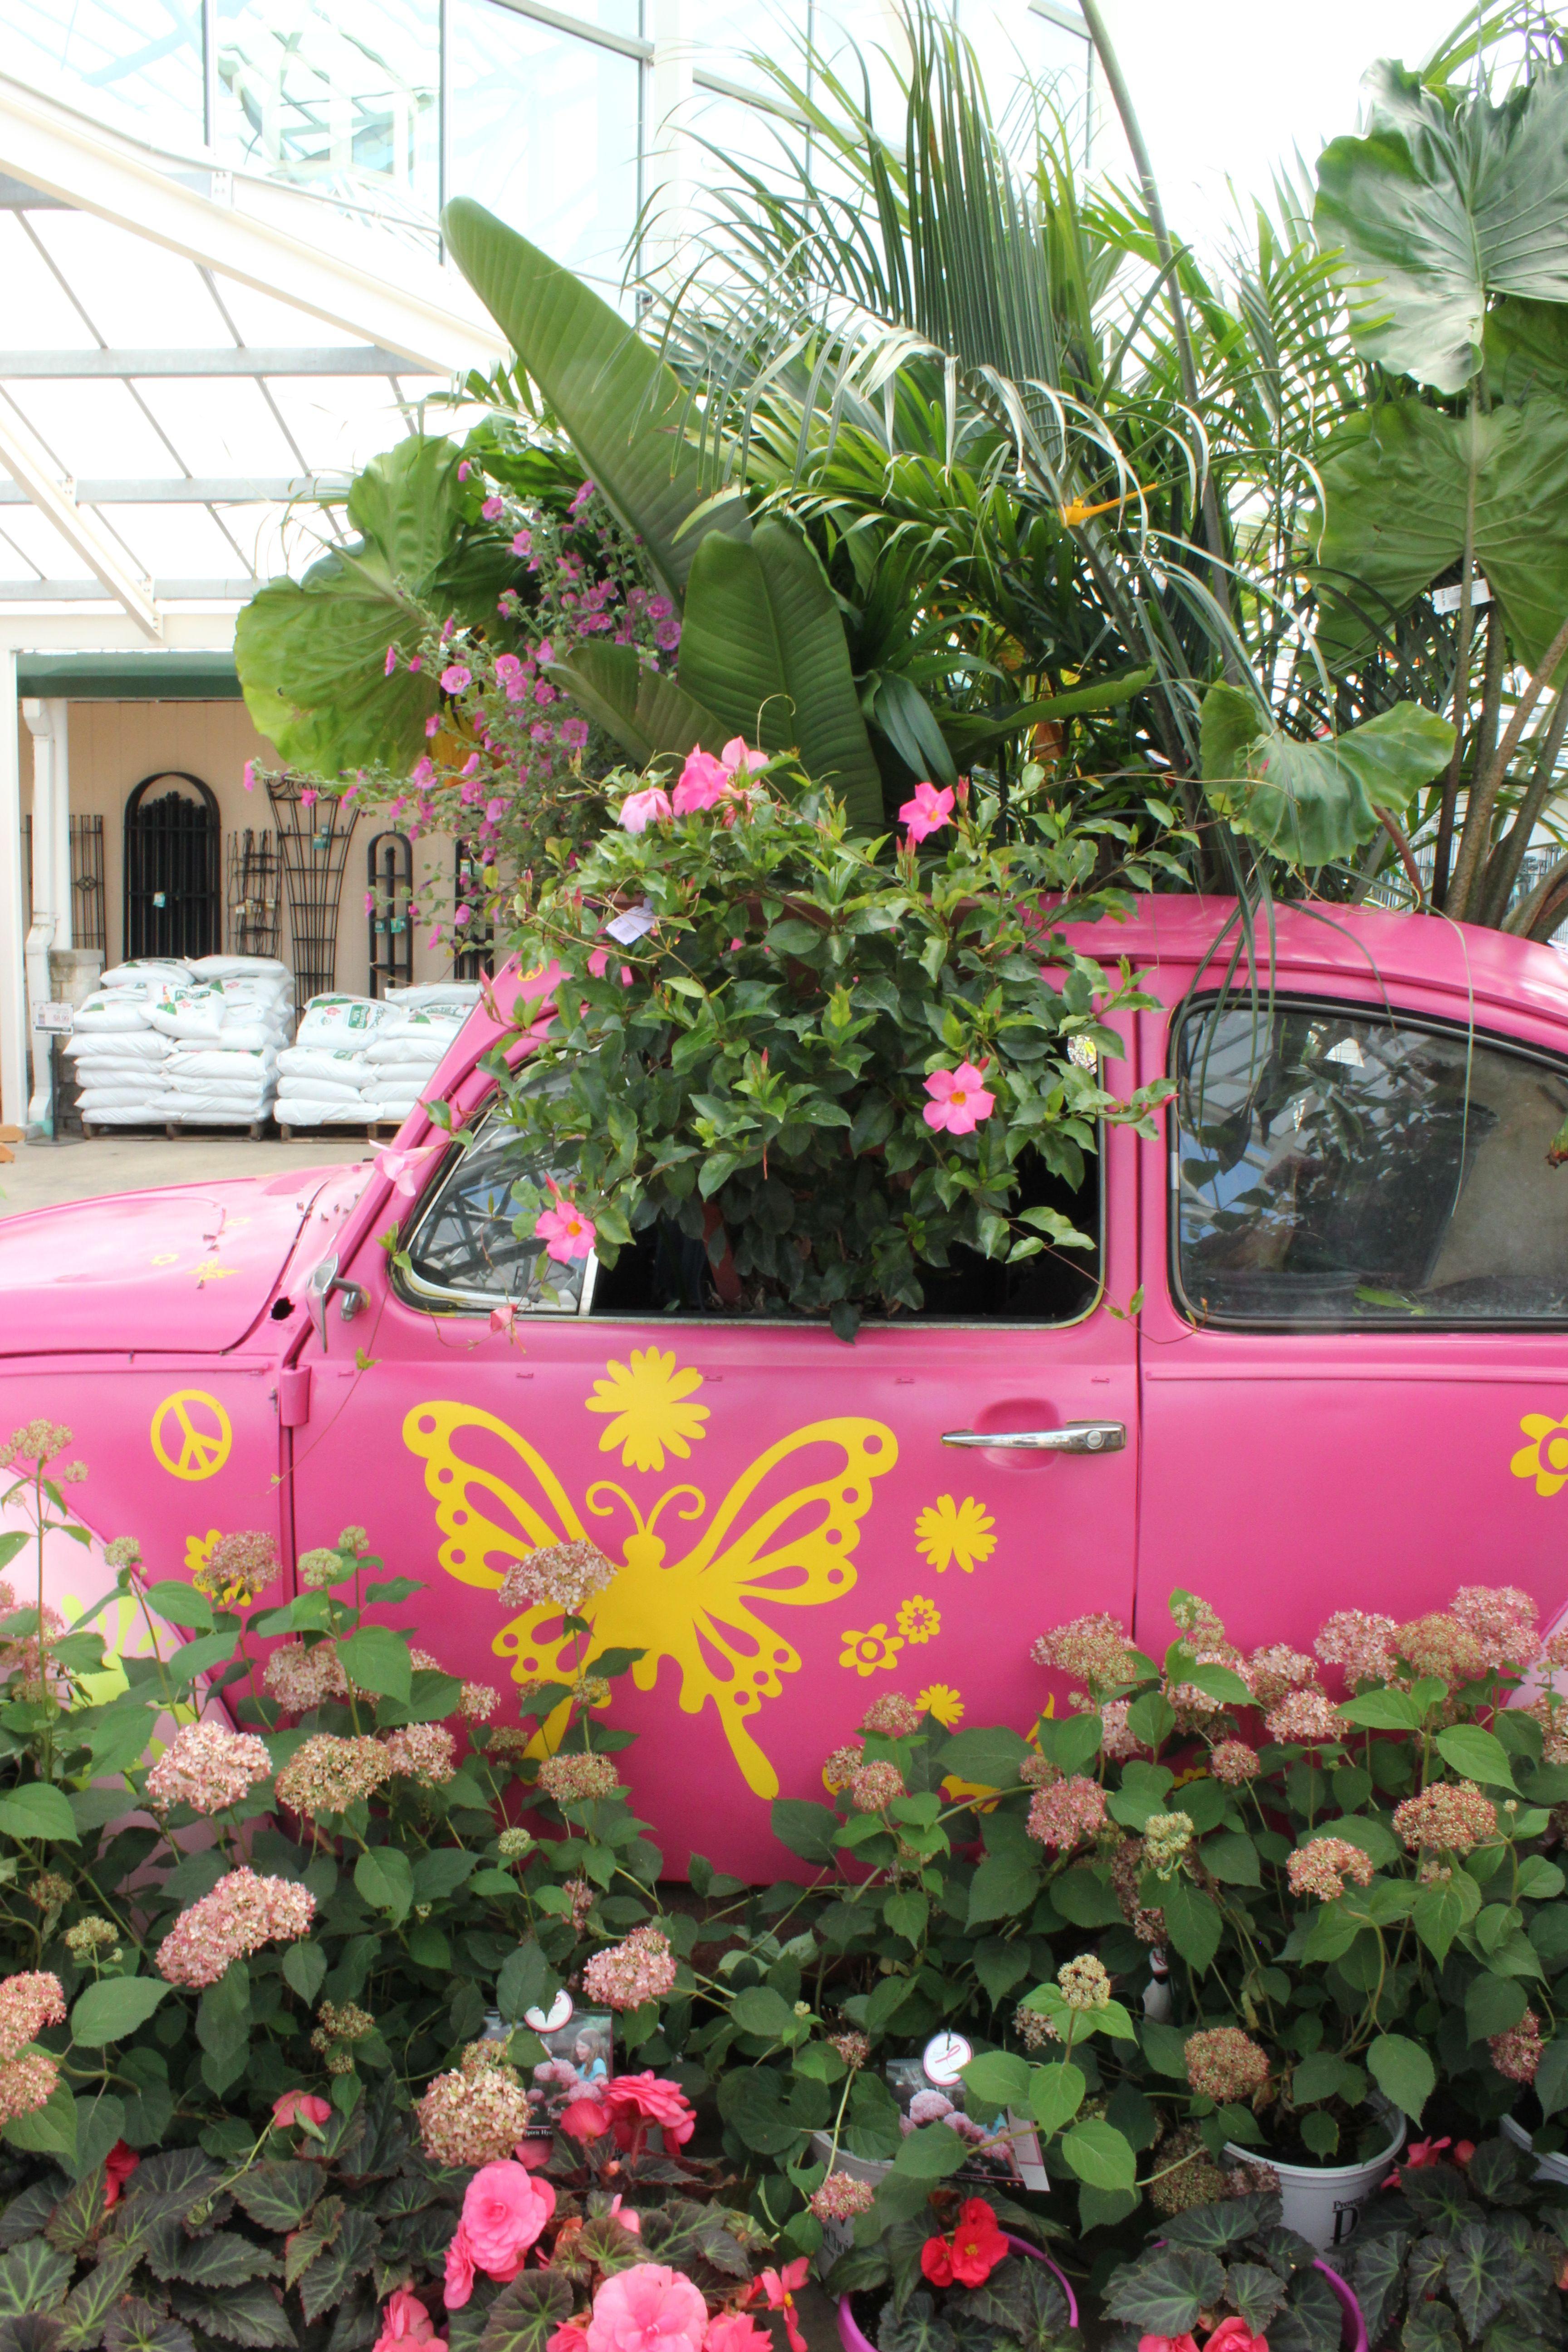 Garden Centre: When Petitti's Garden Center In Ohio Hosted Their Pink Day